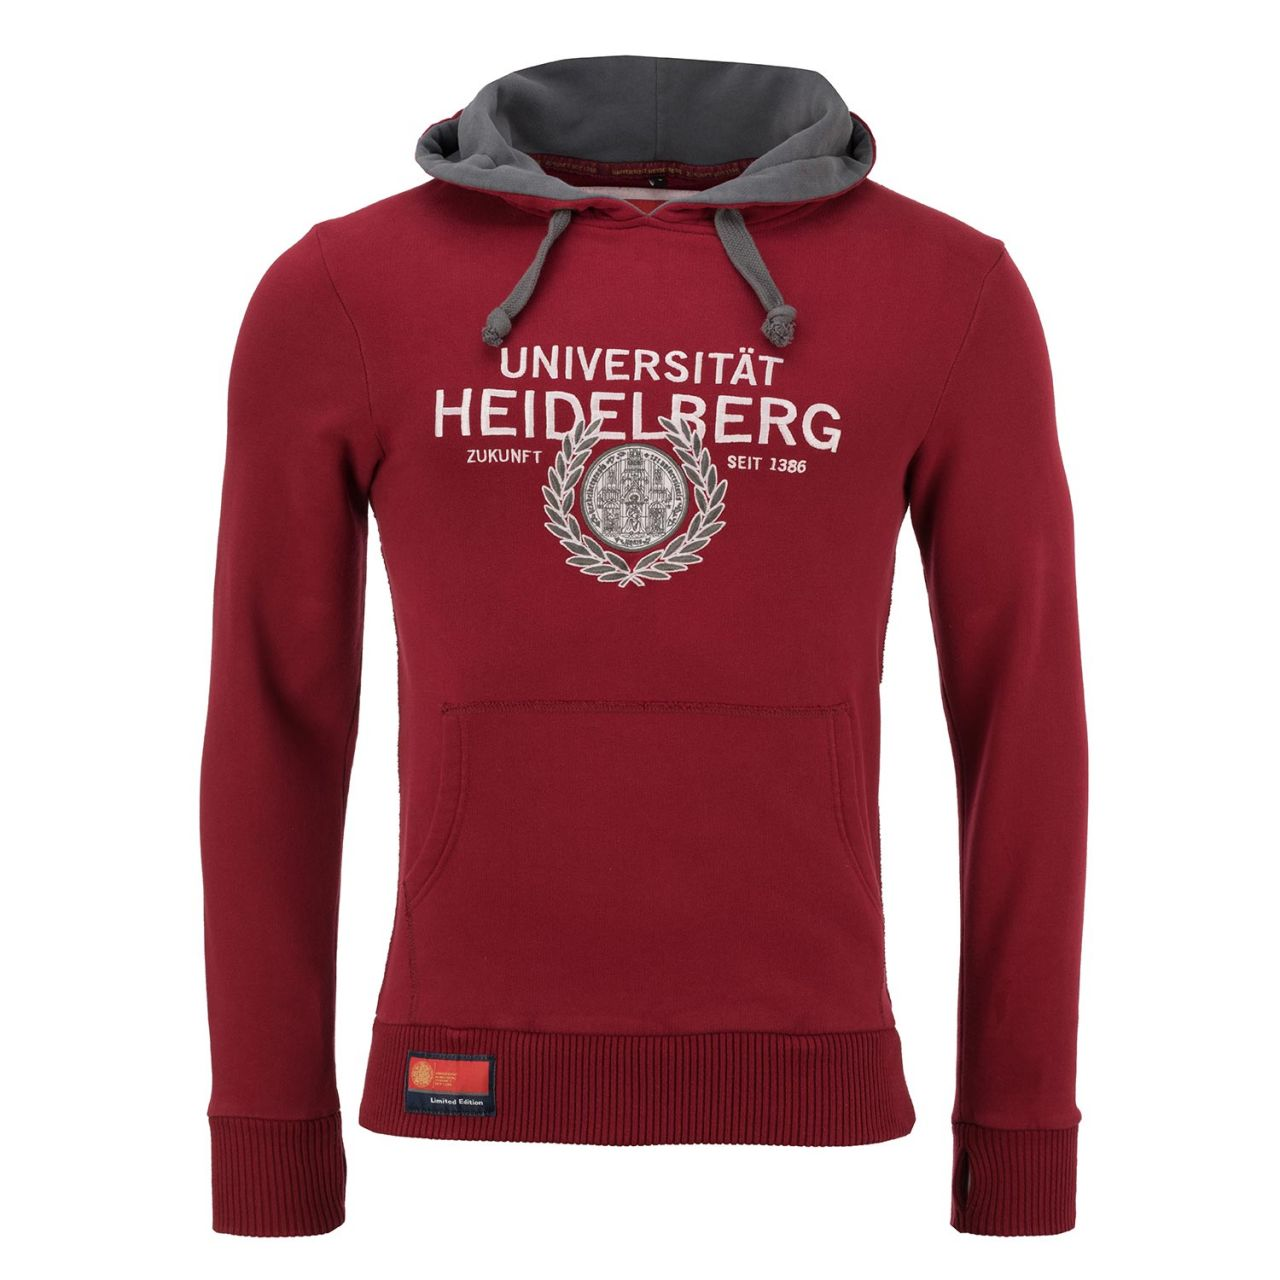 Limited Hooded Sweatshirt, burgundy/grey, exclusive